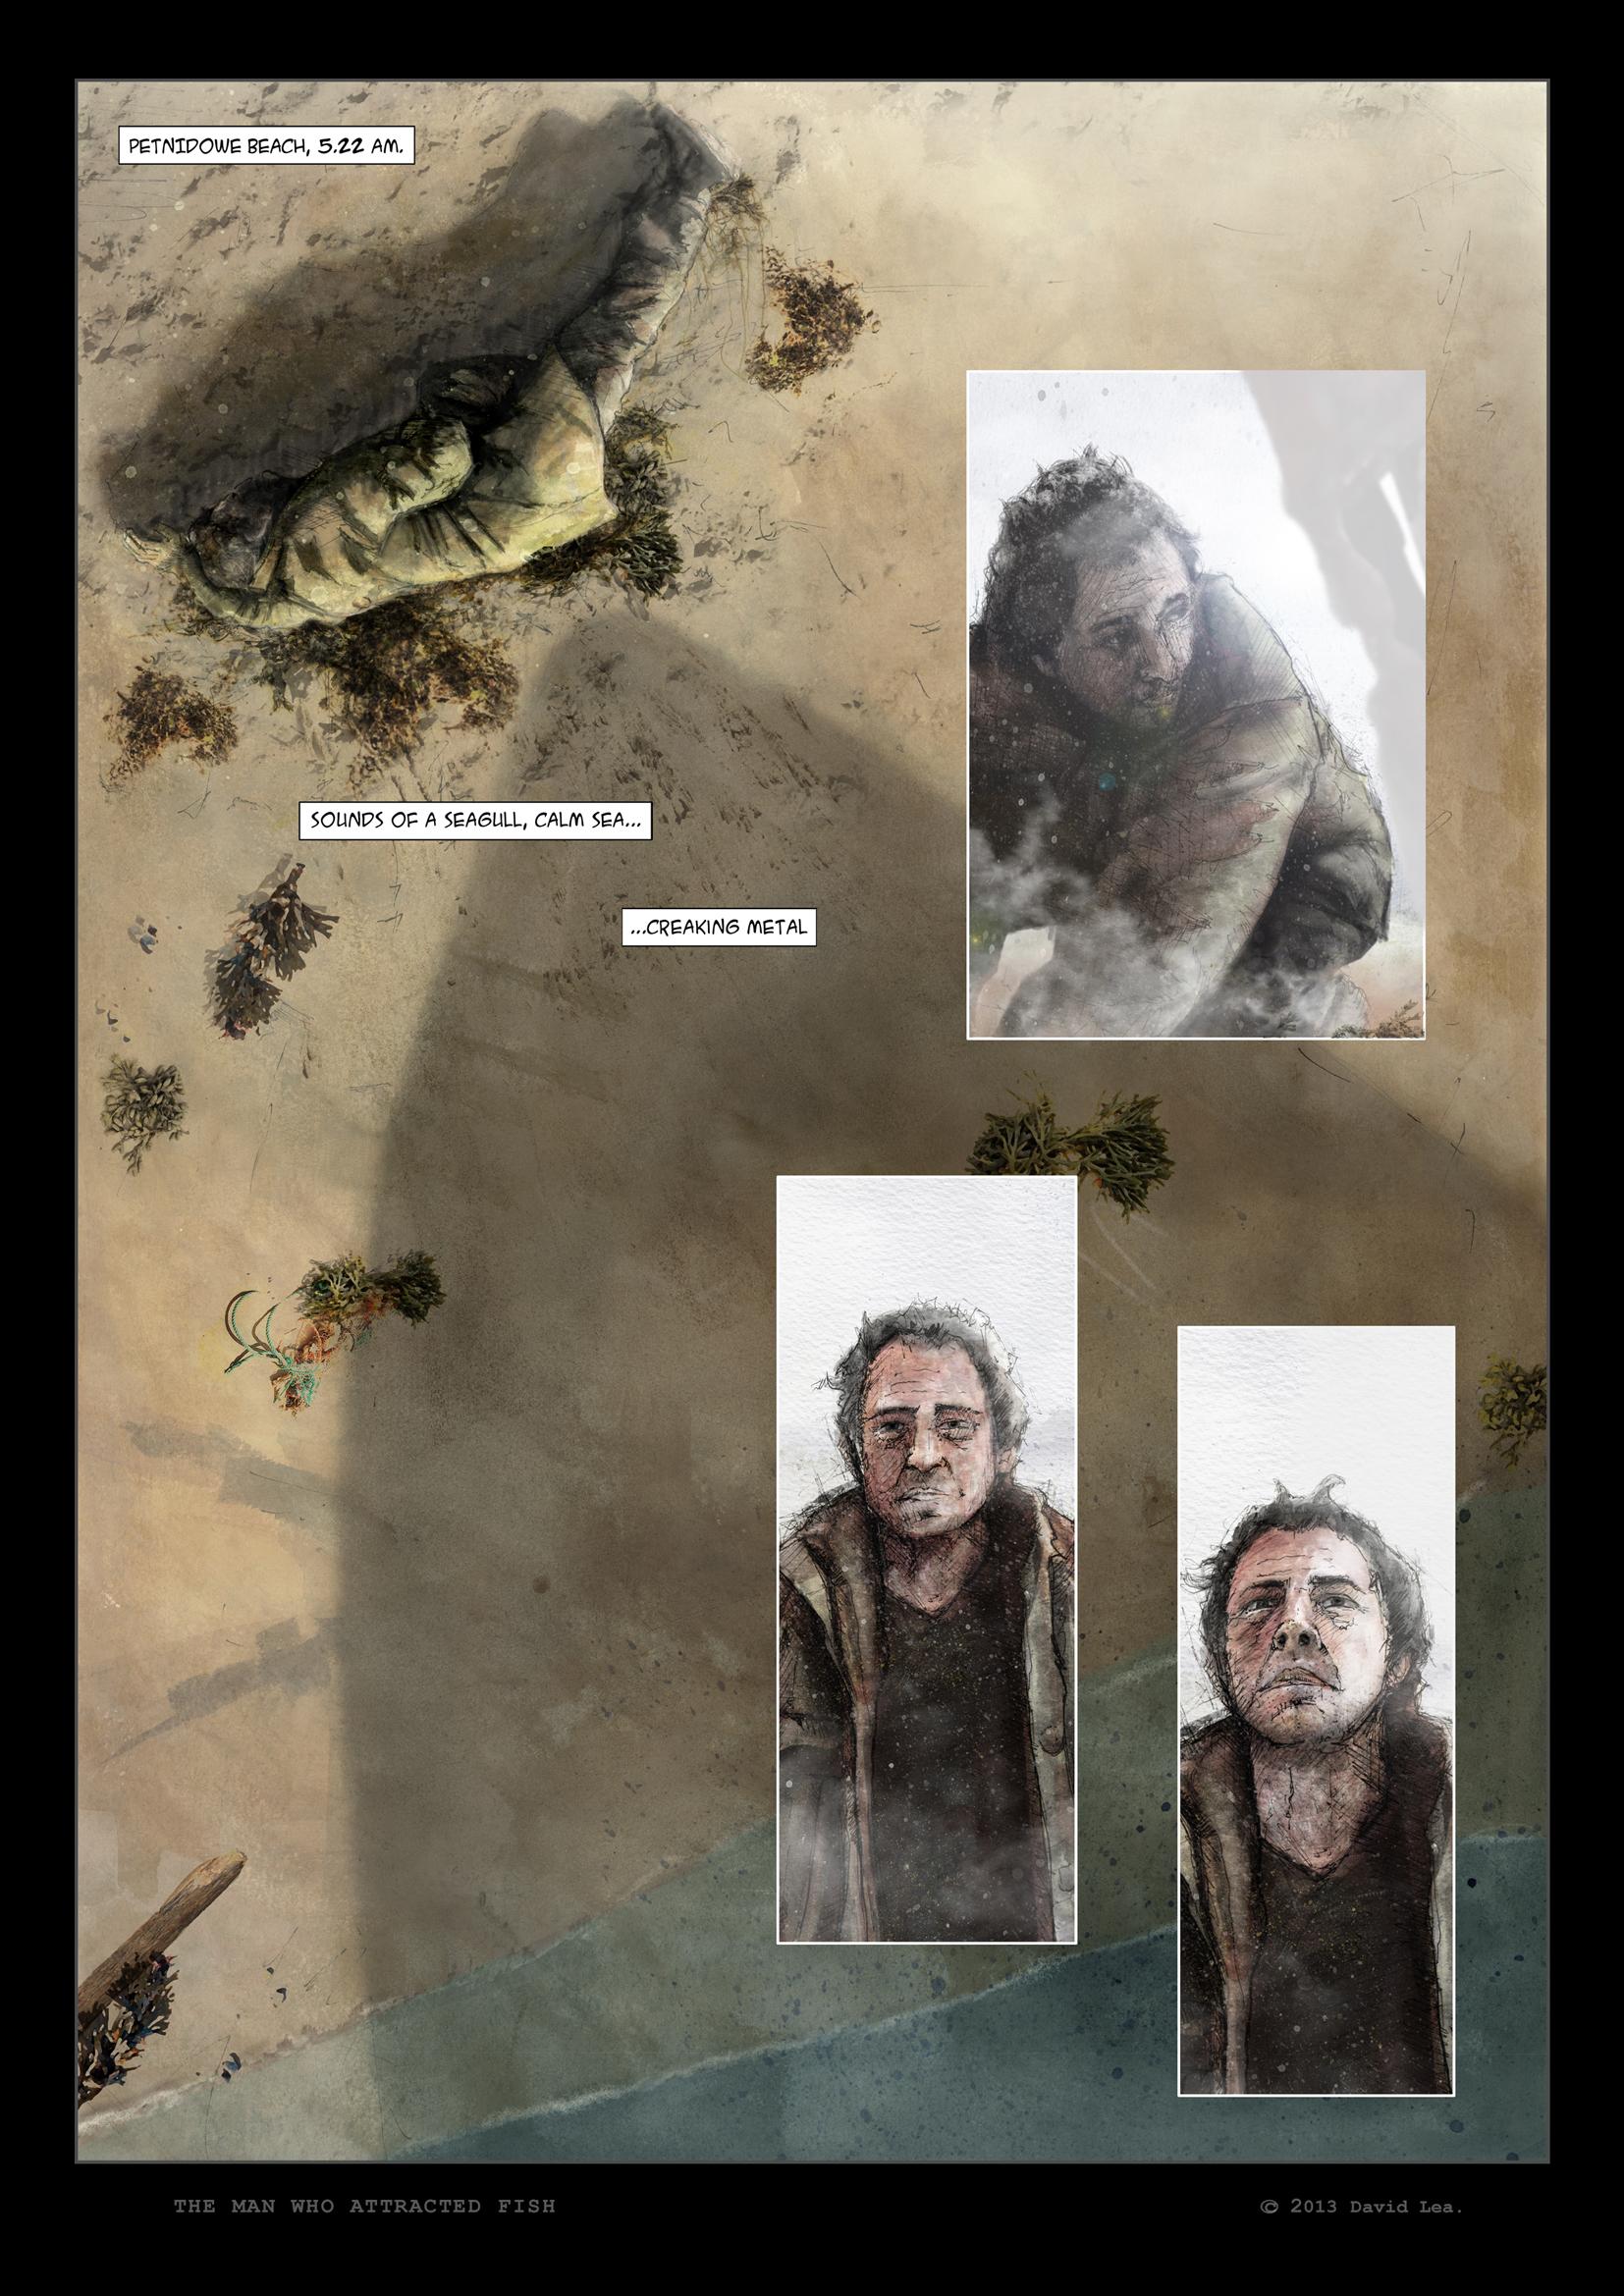 TMWAF_Graphic novel scene - page 7